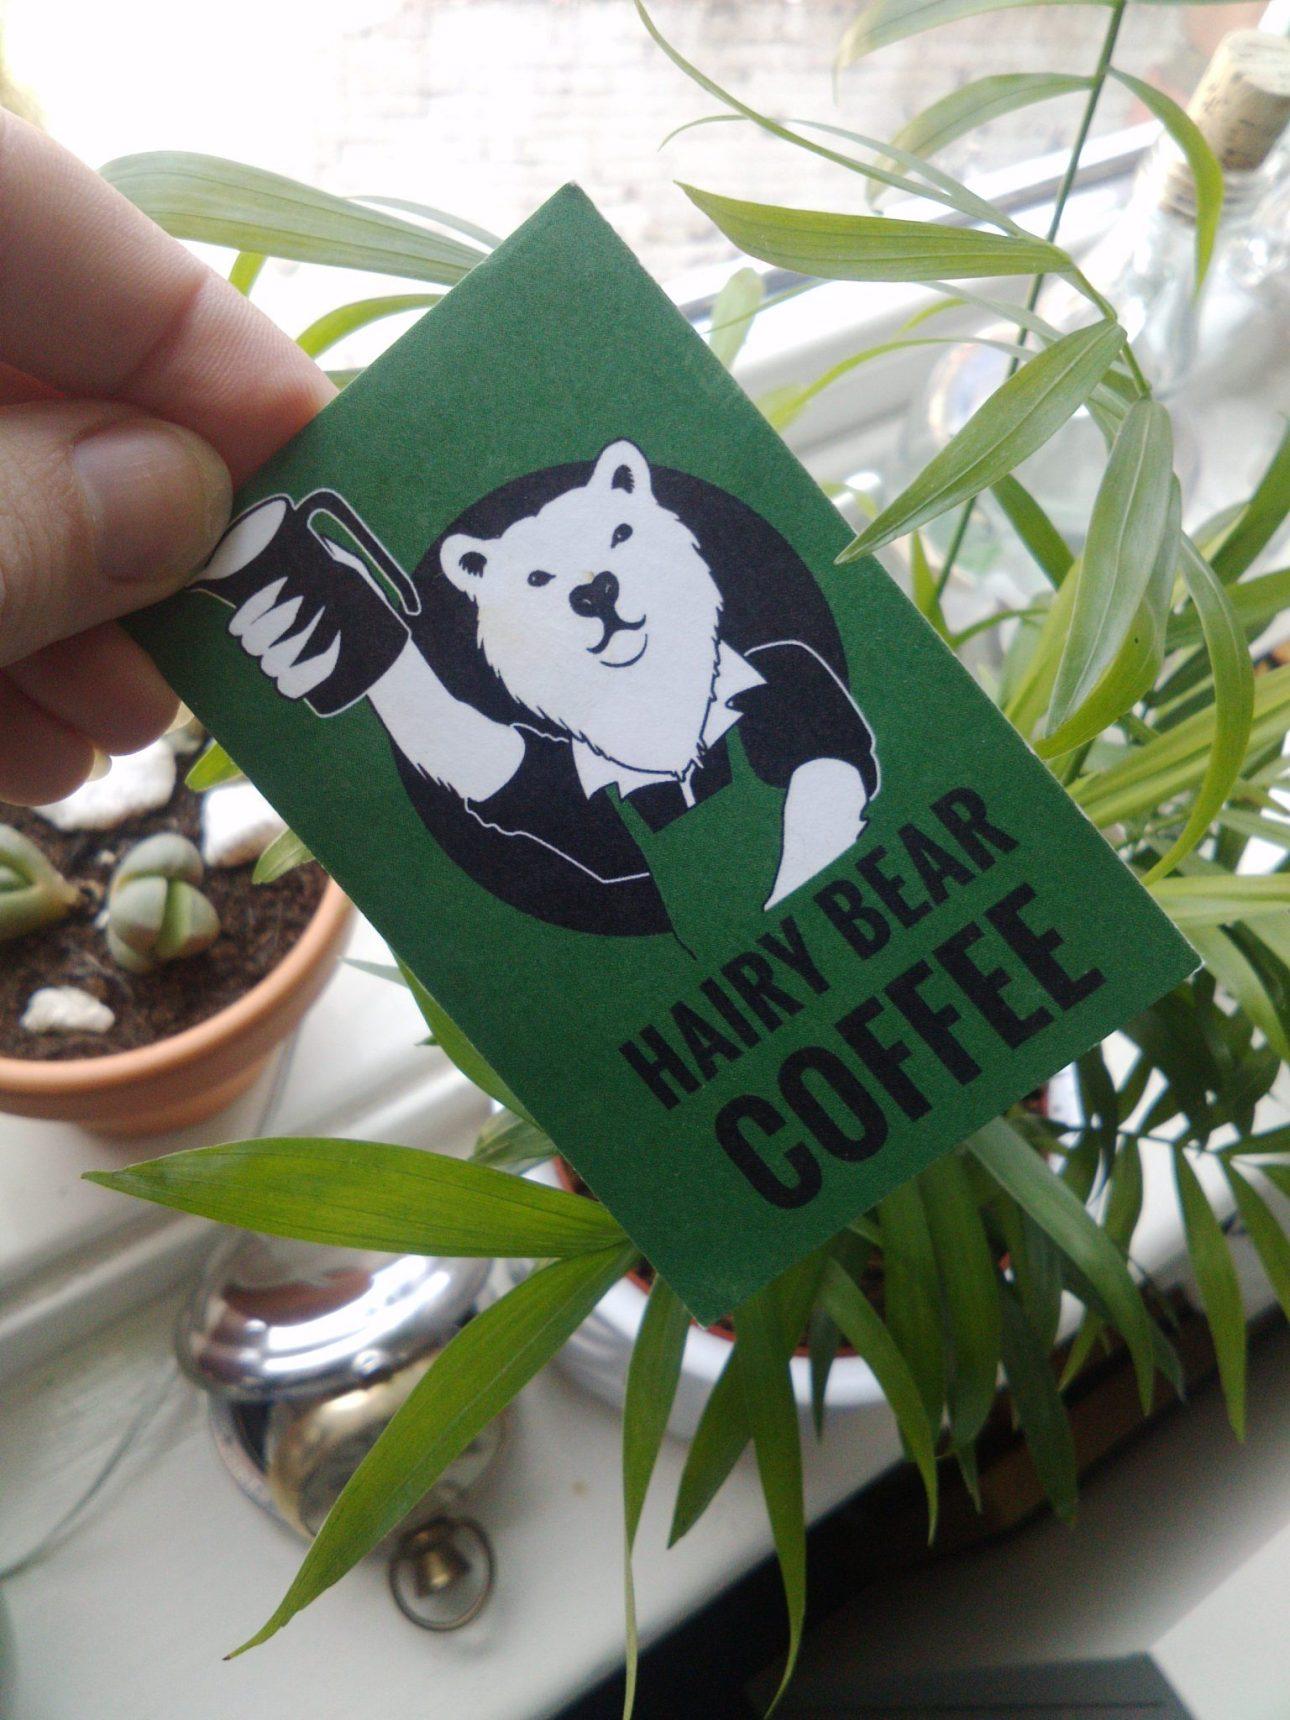 The Hairy Bear Coffee Loyalty Card, logo design by Britt Coxon.